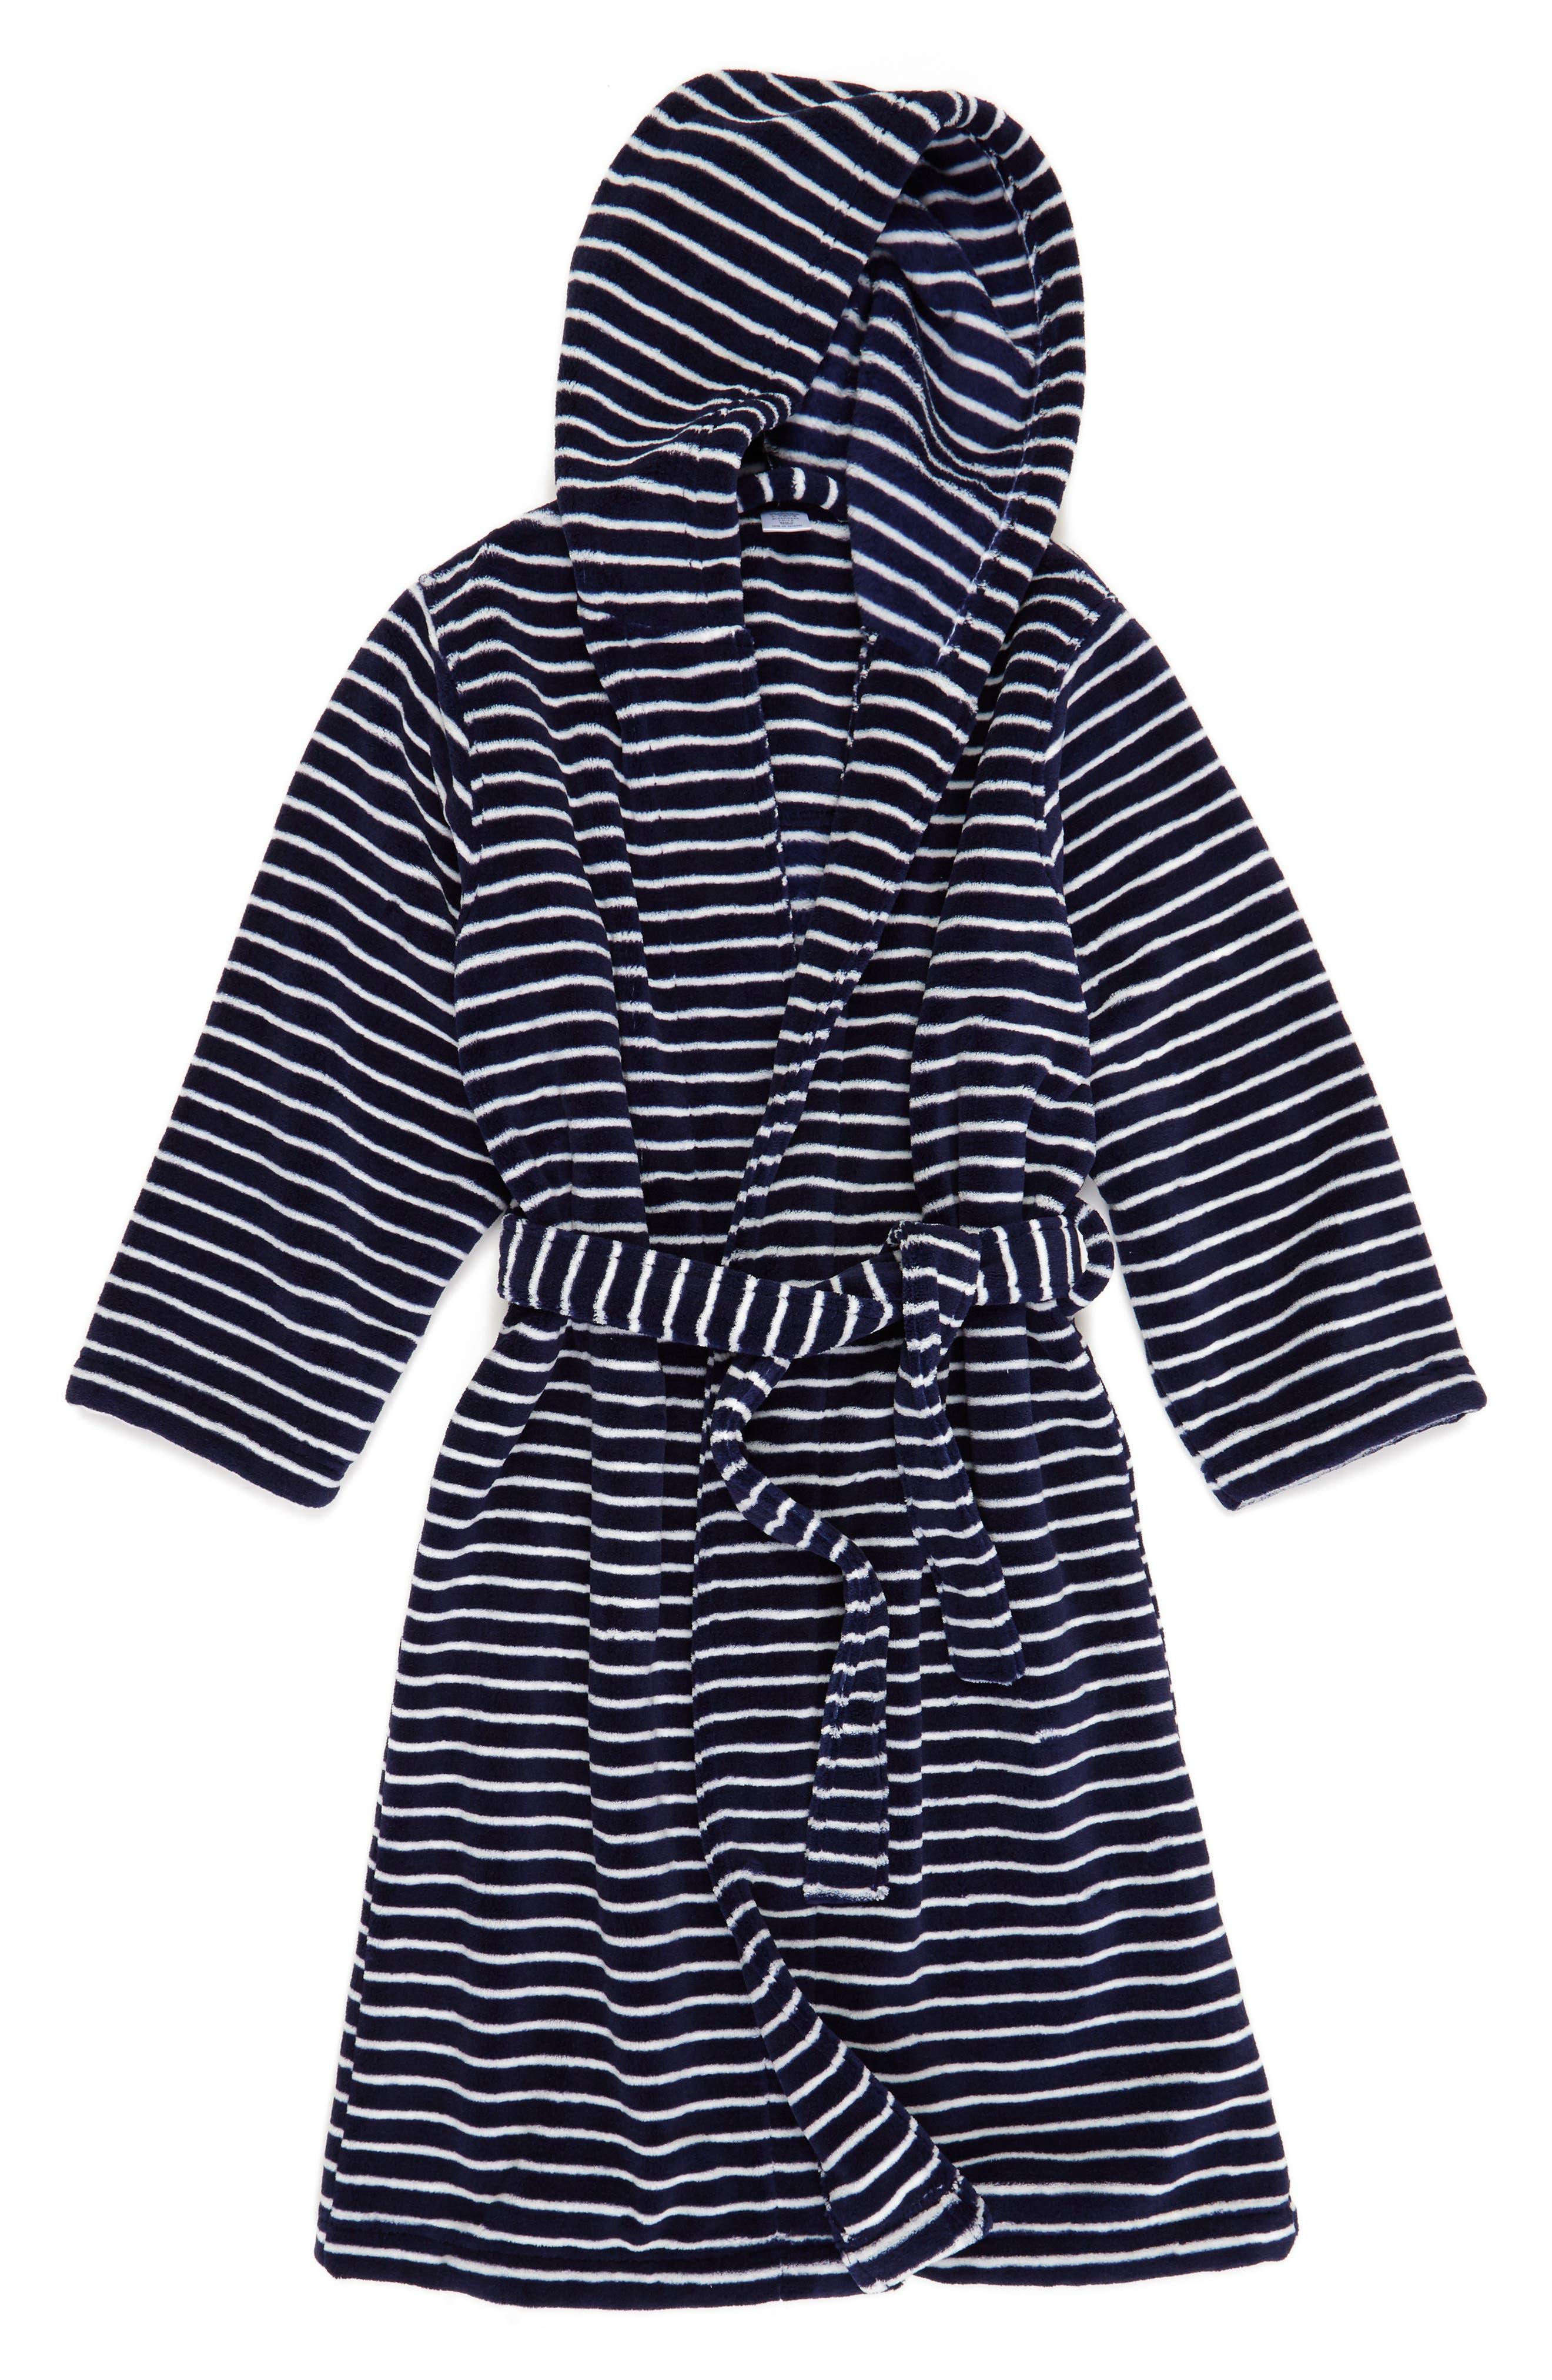 Hooded Plush Robe,                         Main,                         color, Navy Peacoat- Ivory Stripe